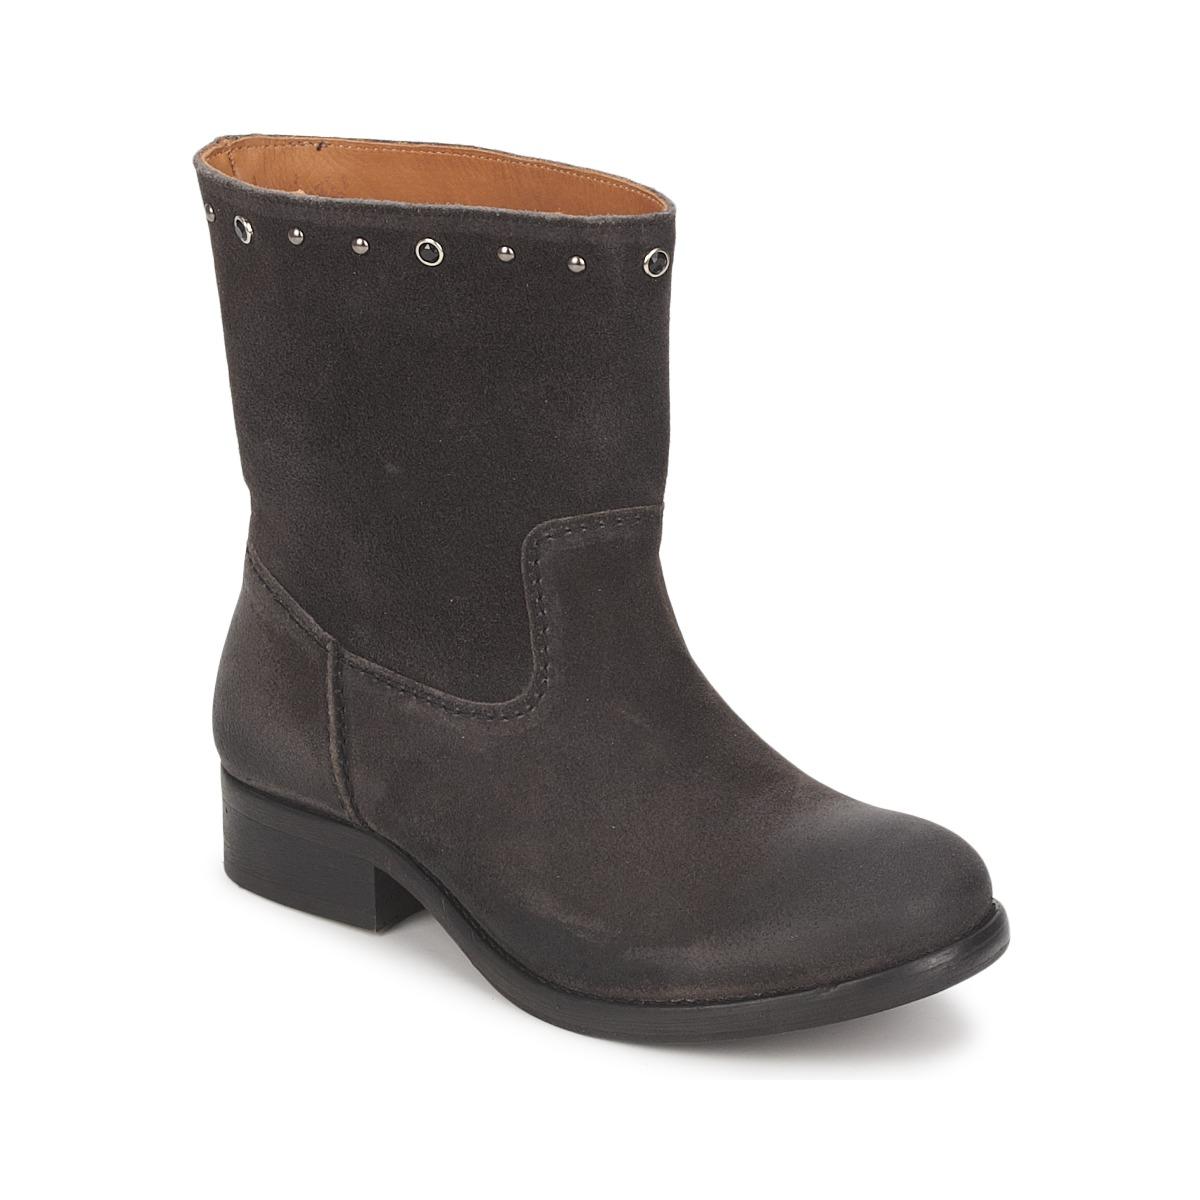 Koah NOMADE Schwarz - Kostenloser Versand bei Spartoode ! - Schuhe Boots Damen 87,50 €